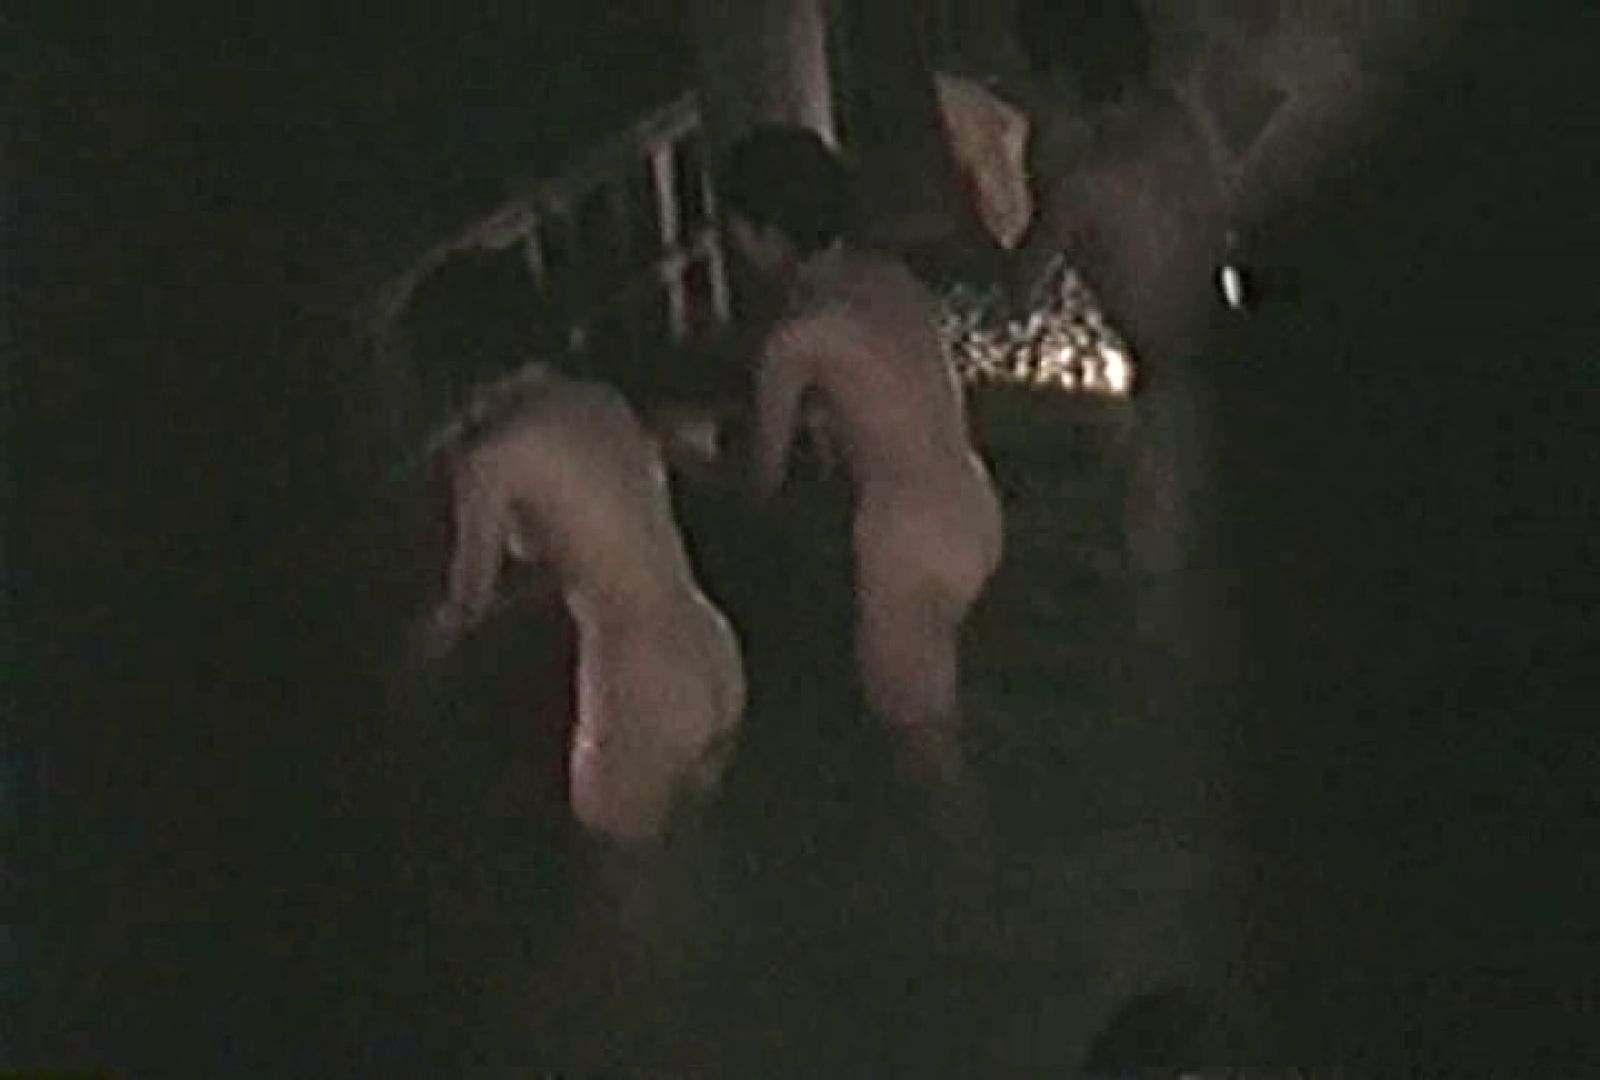 WAC 露天風呂Vol.2 脱衣所 隠し撮りセックス画像 39pic 14